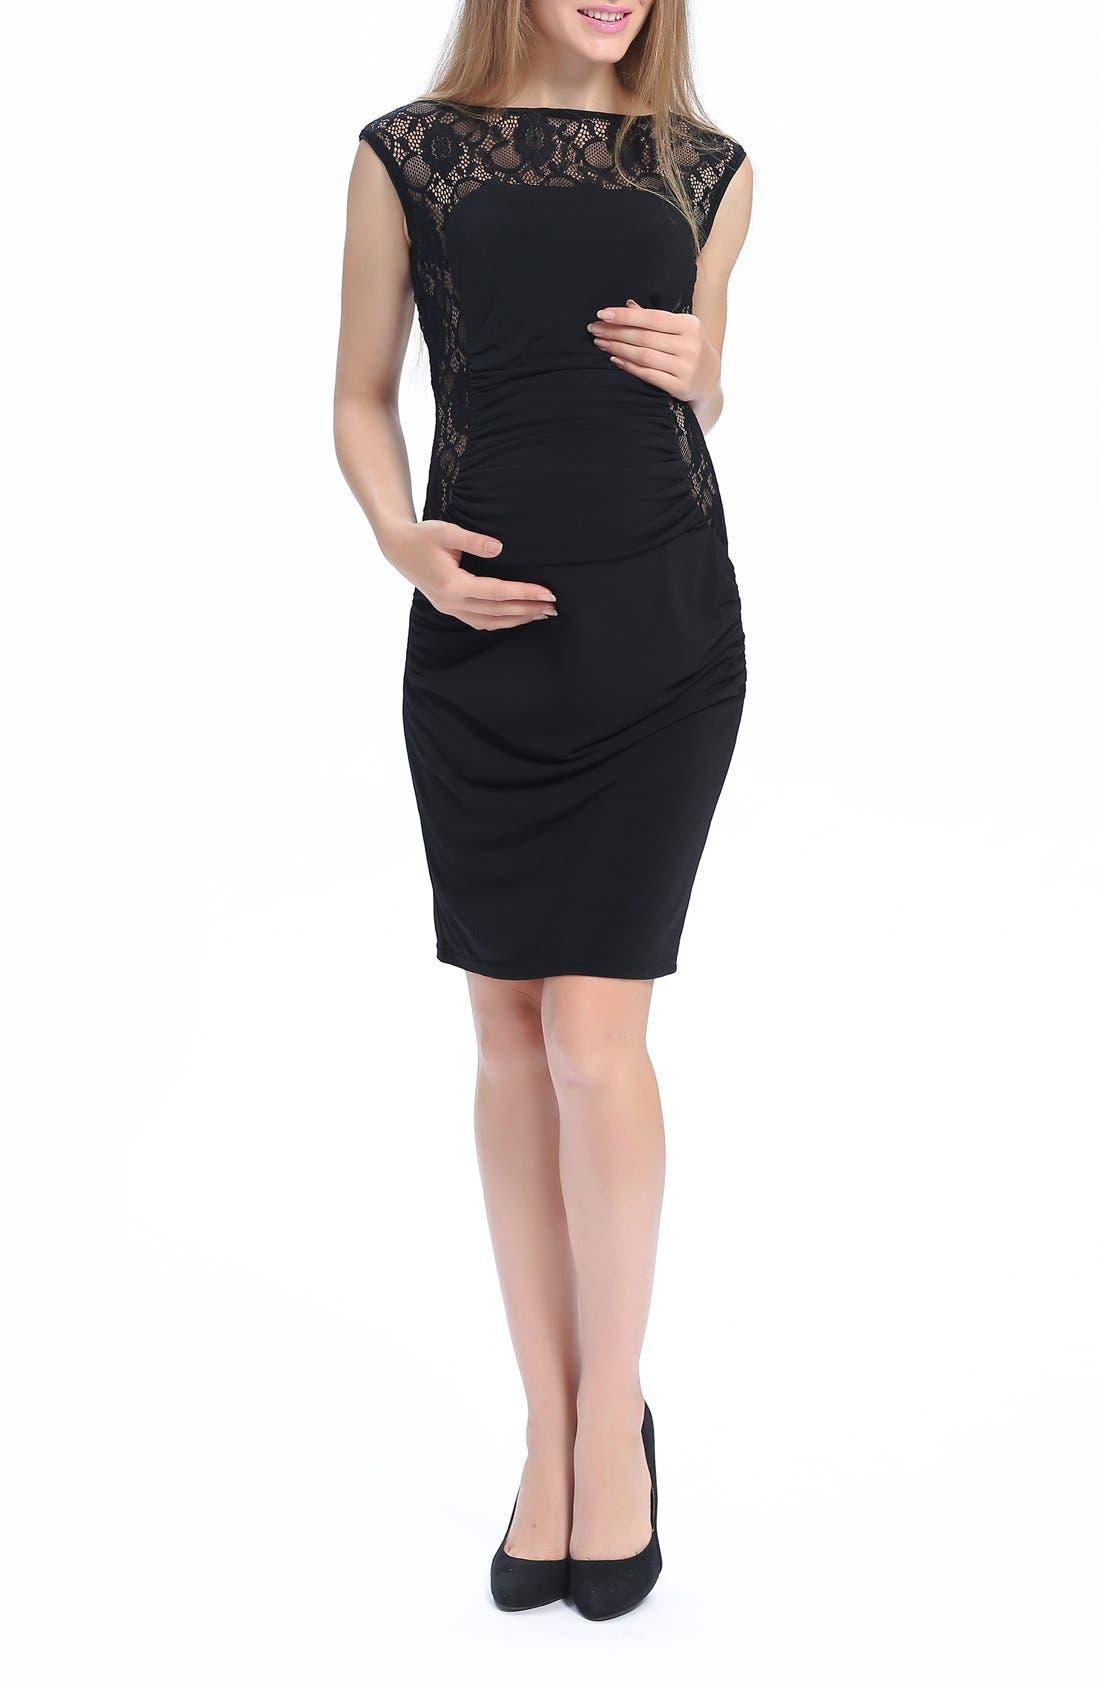 Alternate Image 1 Selected - Kimi and Kai Valentina Lace Maternity Dress